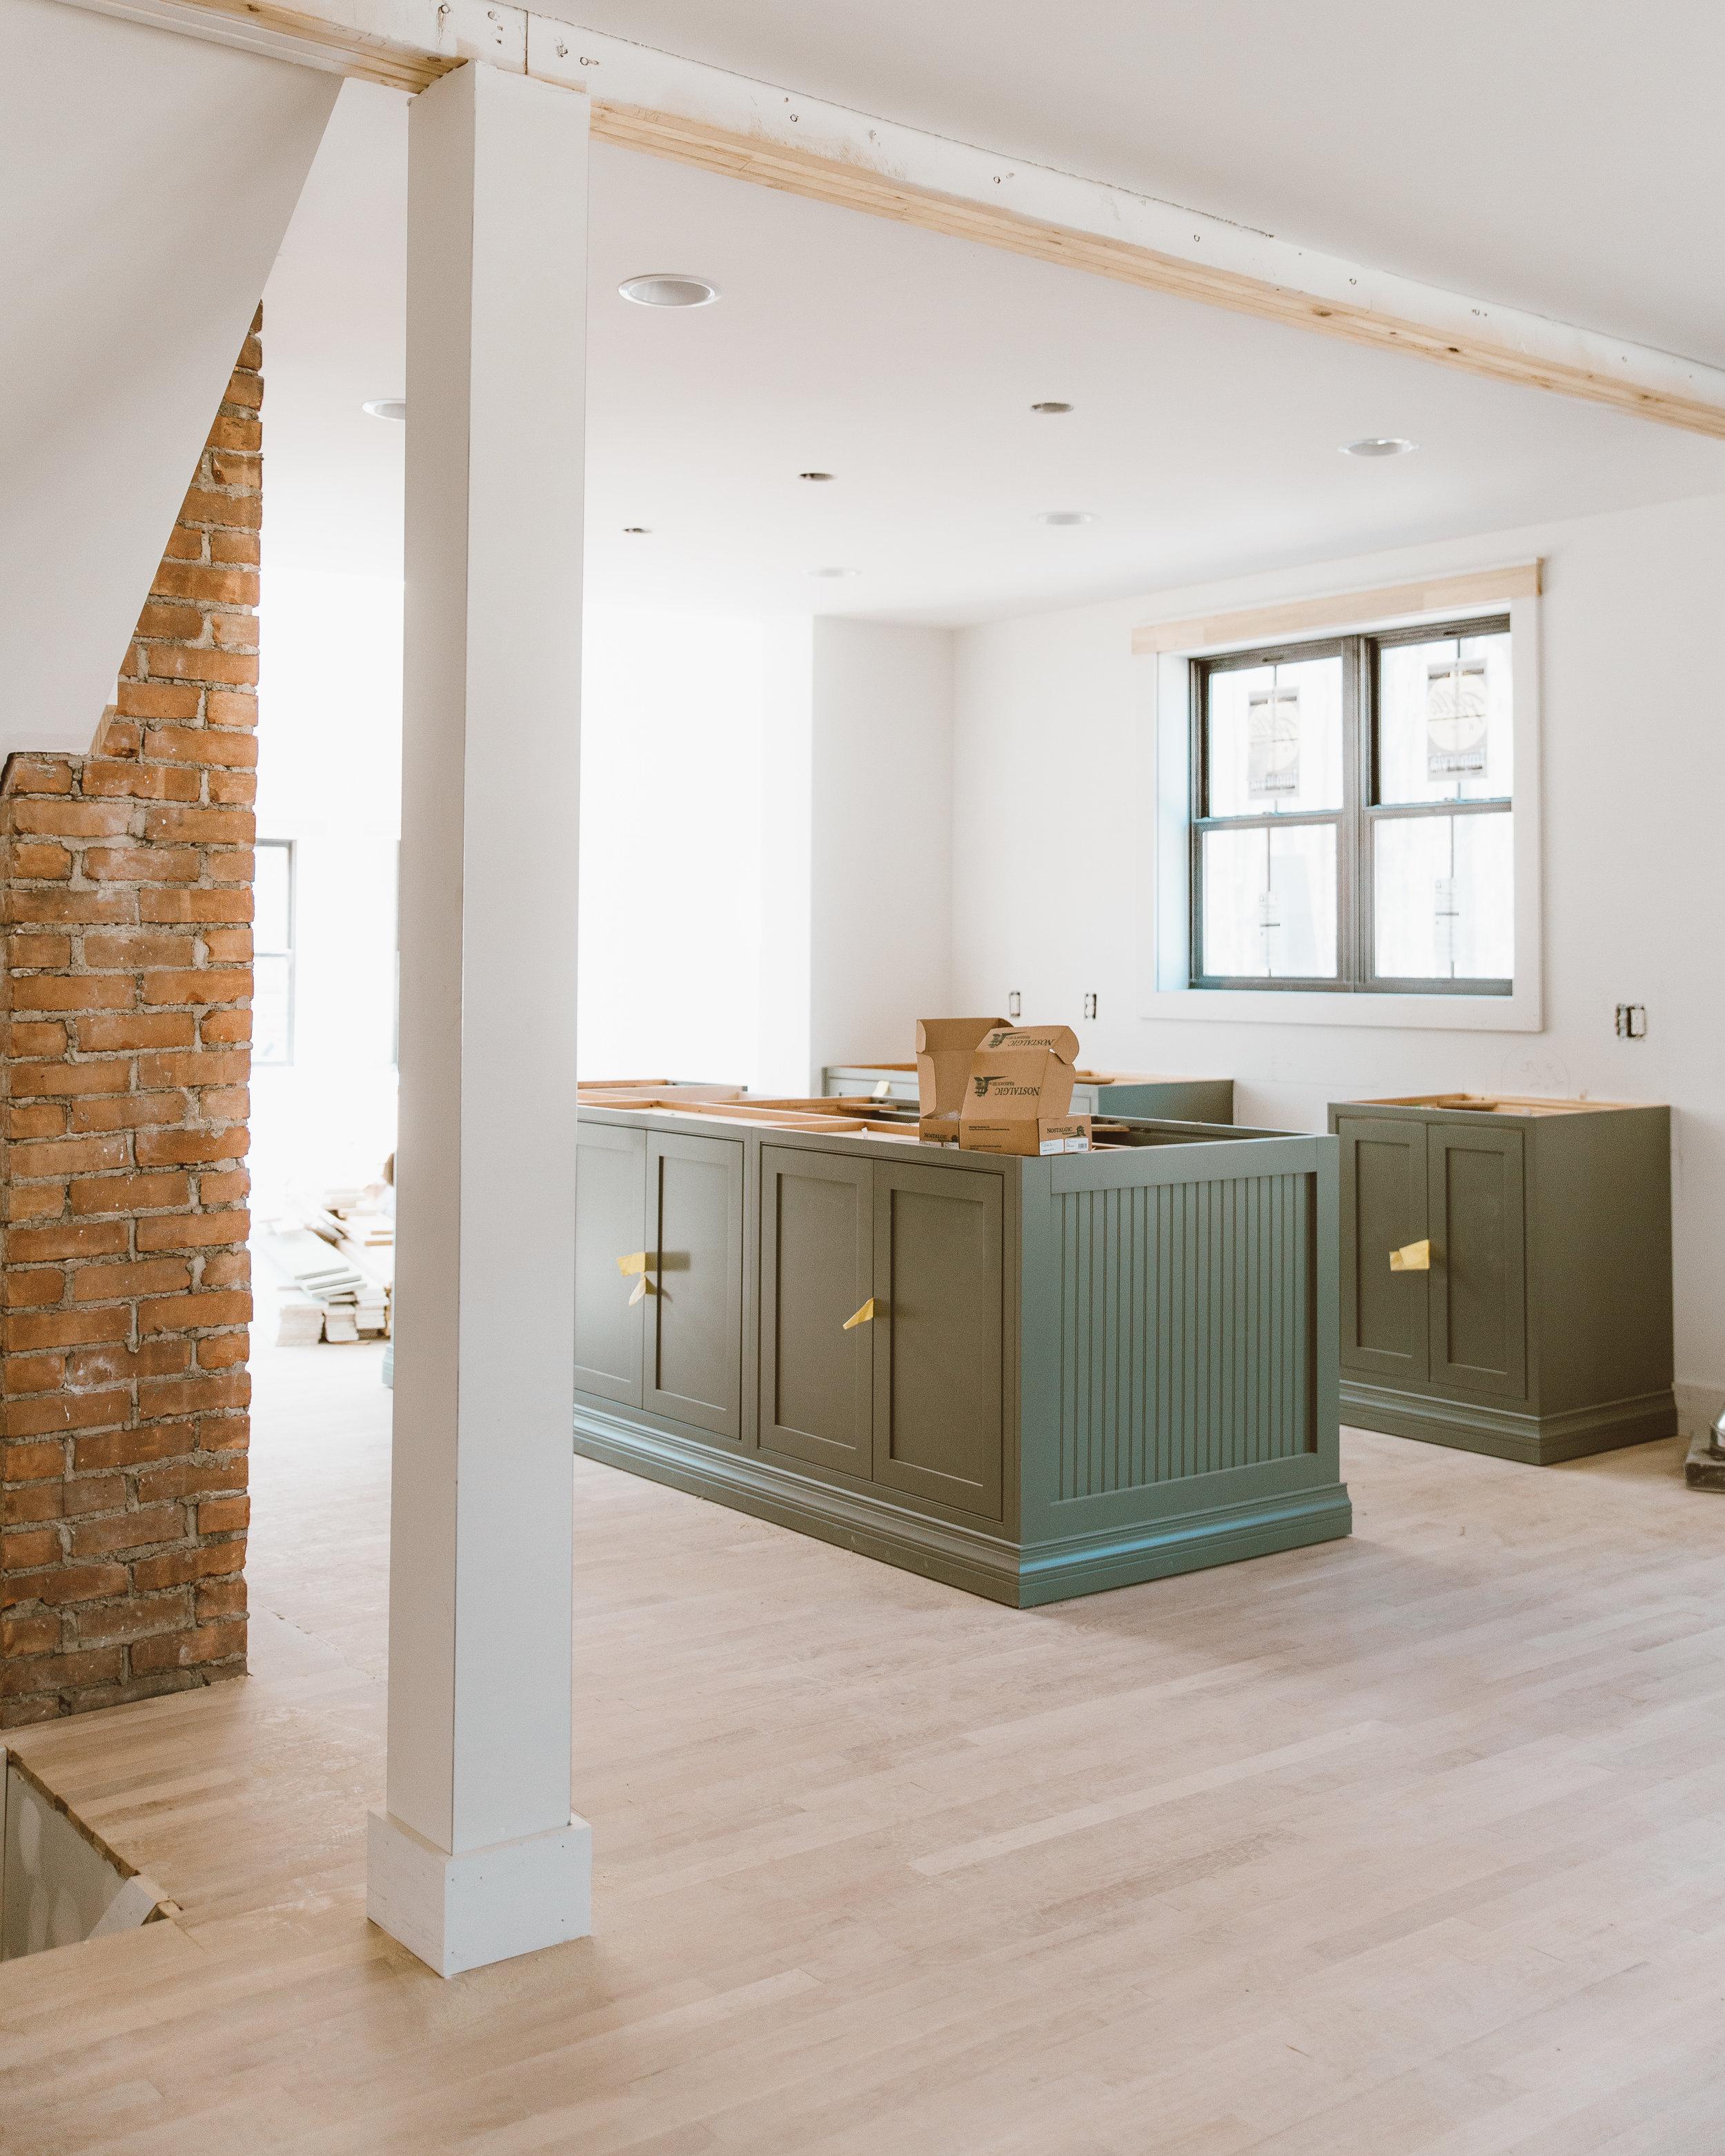 forthehome-kitchencabinets1.jpg